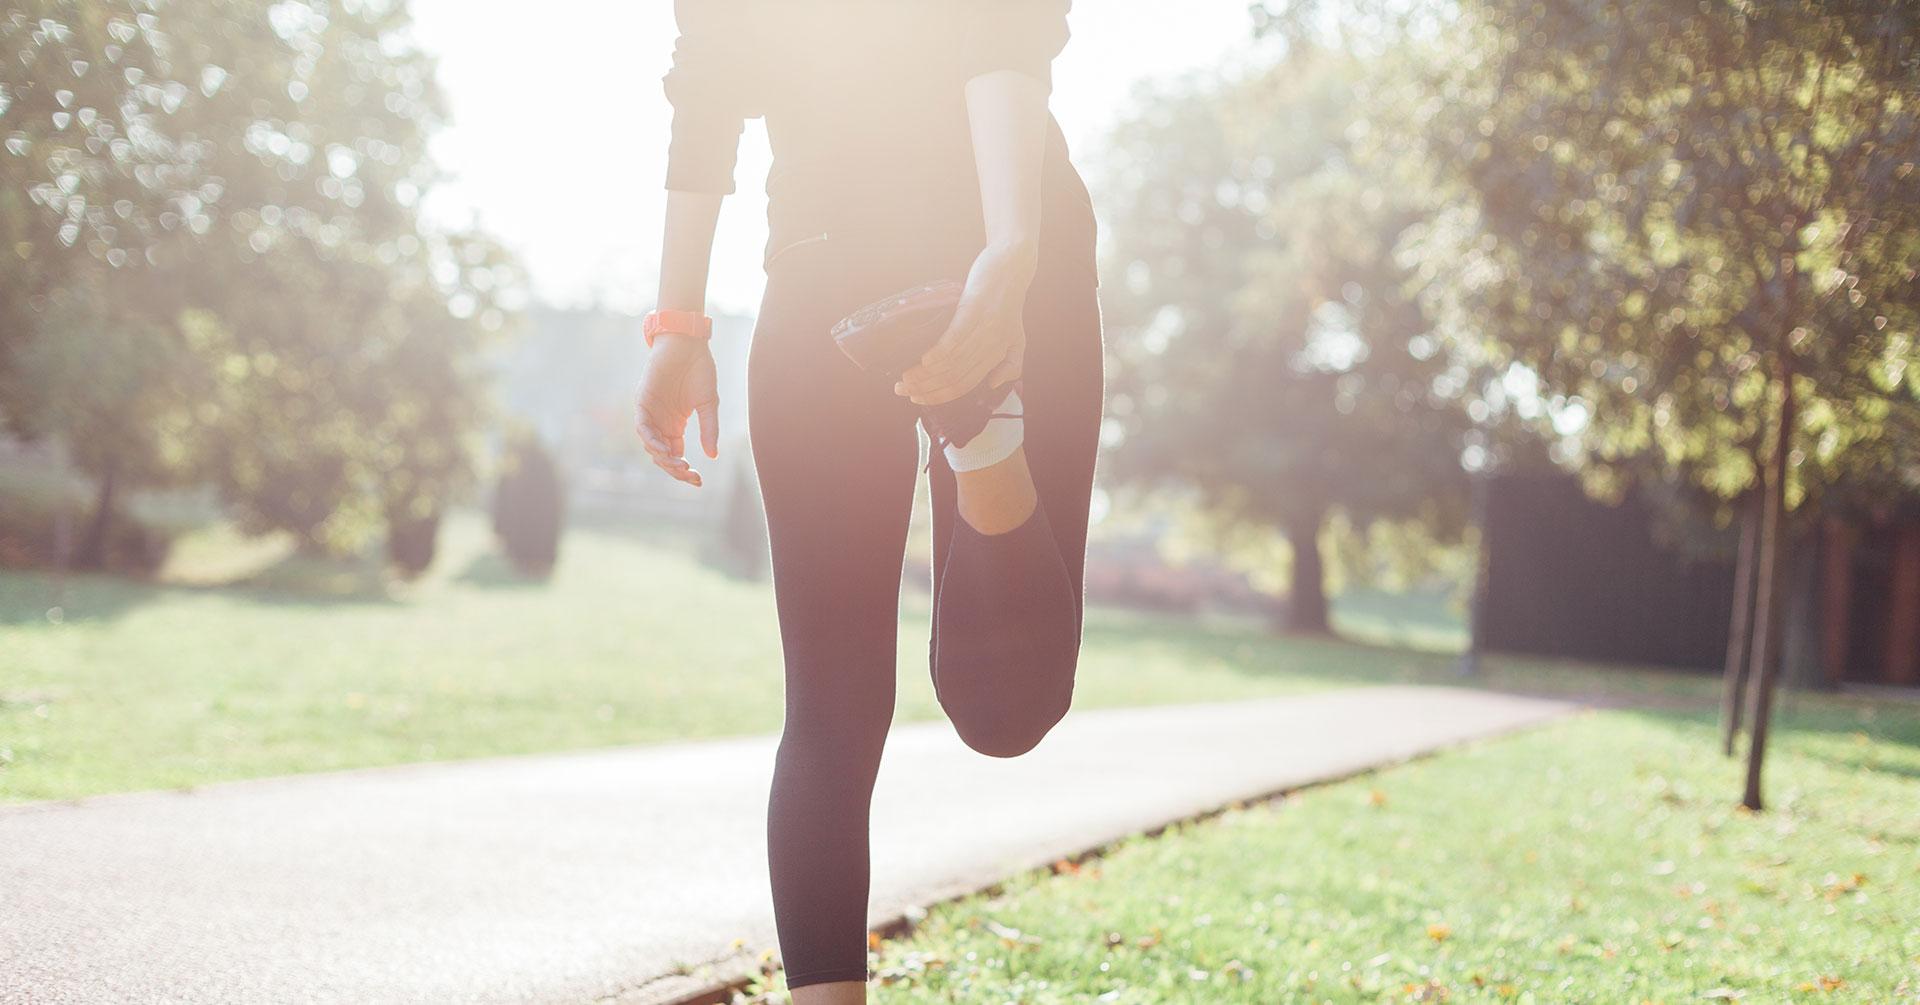 Preguntas frecuentes para principiantes de un Medio Maratón